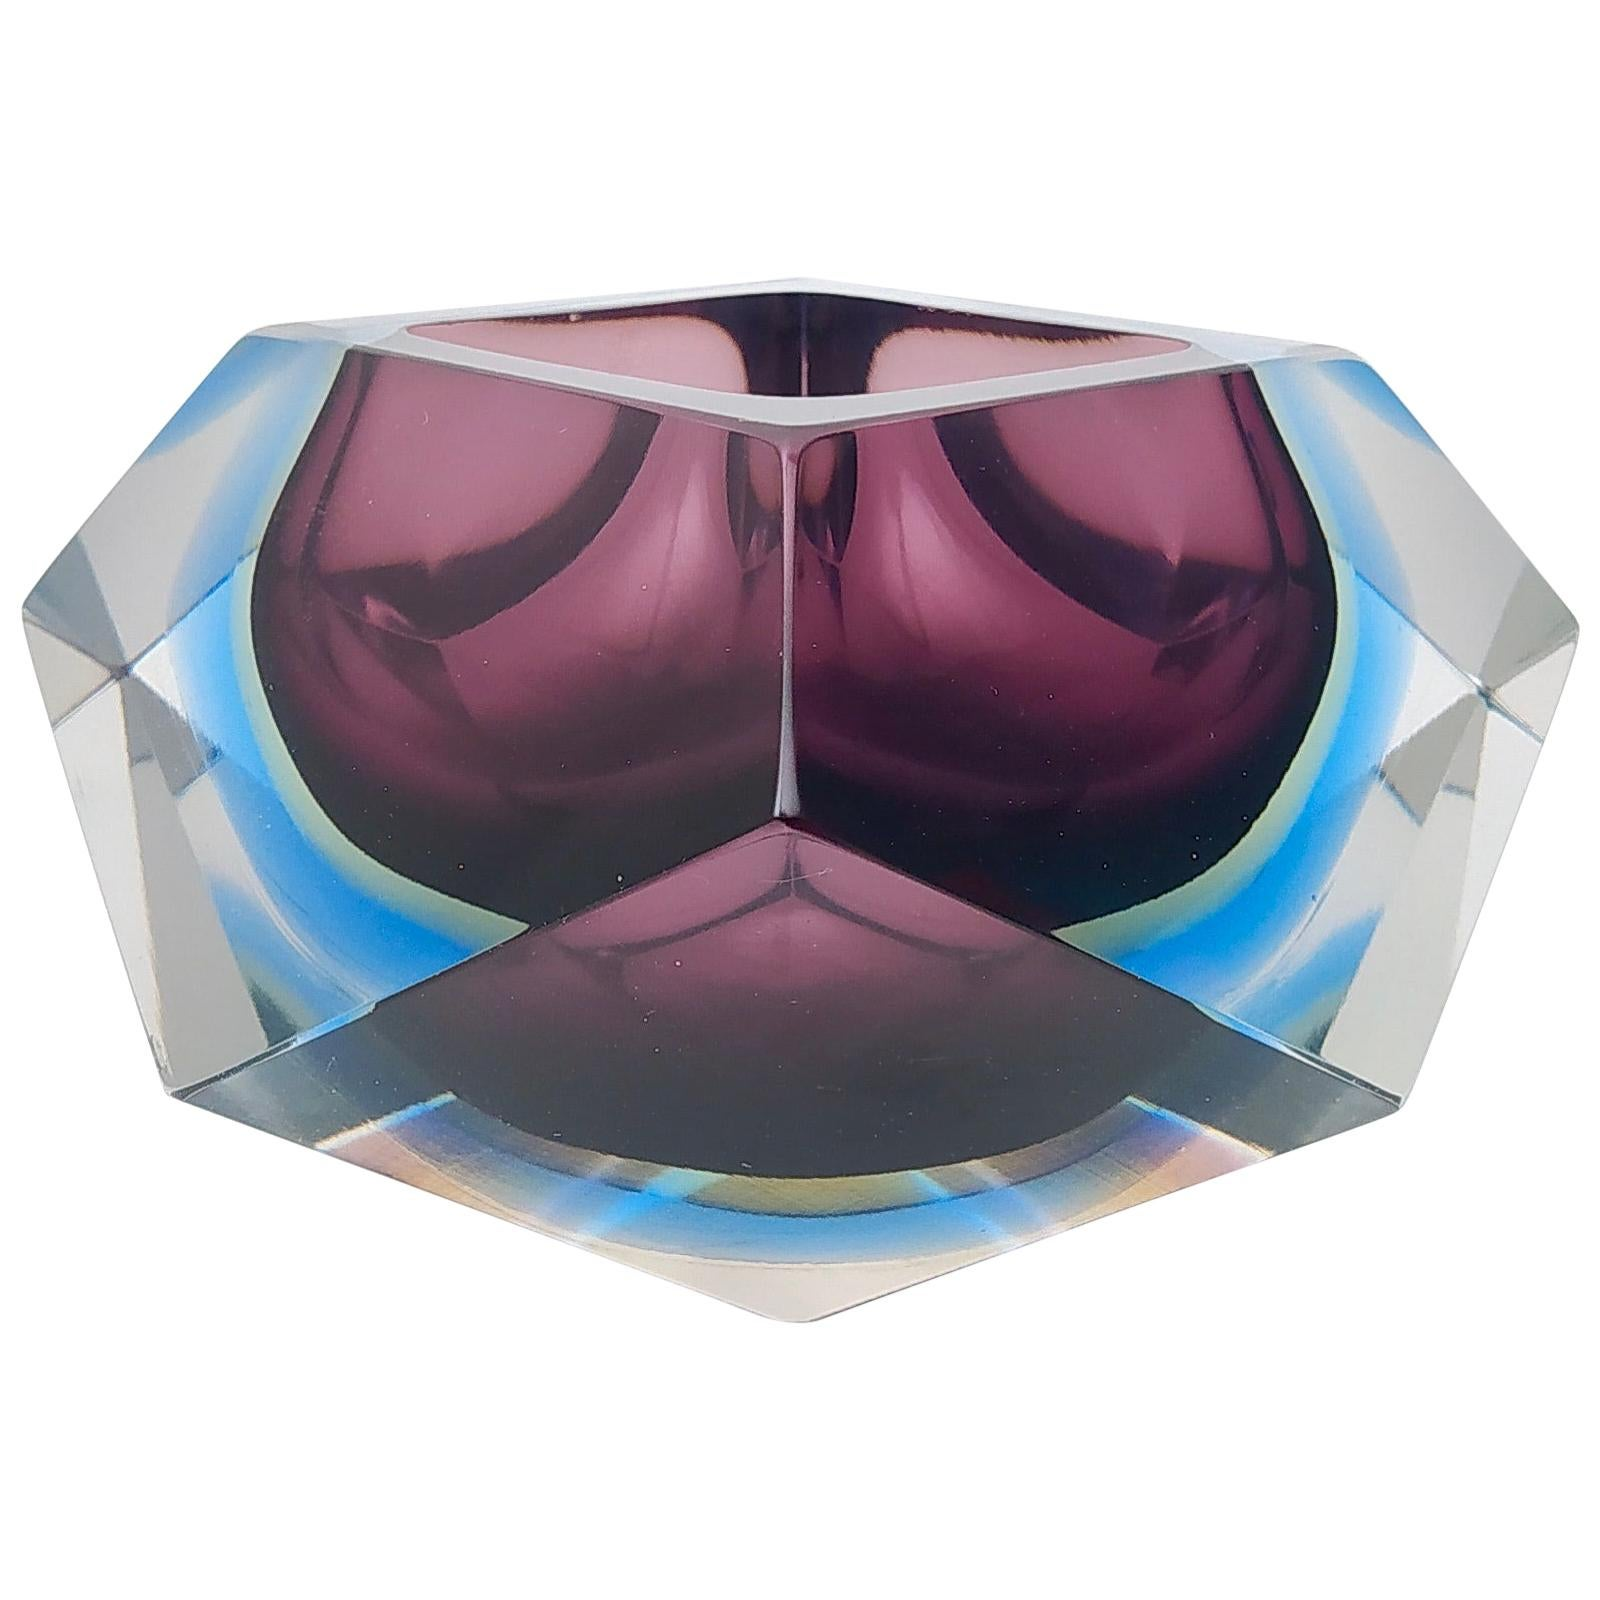 Diamond Shaped Sommerso Glass Ashtray or Catchall by Flavio Poli, Italy, 1960s